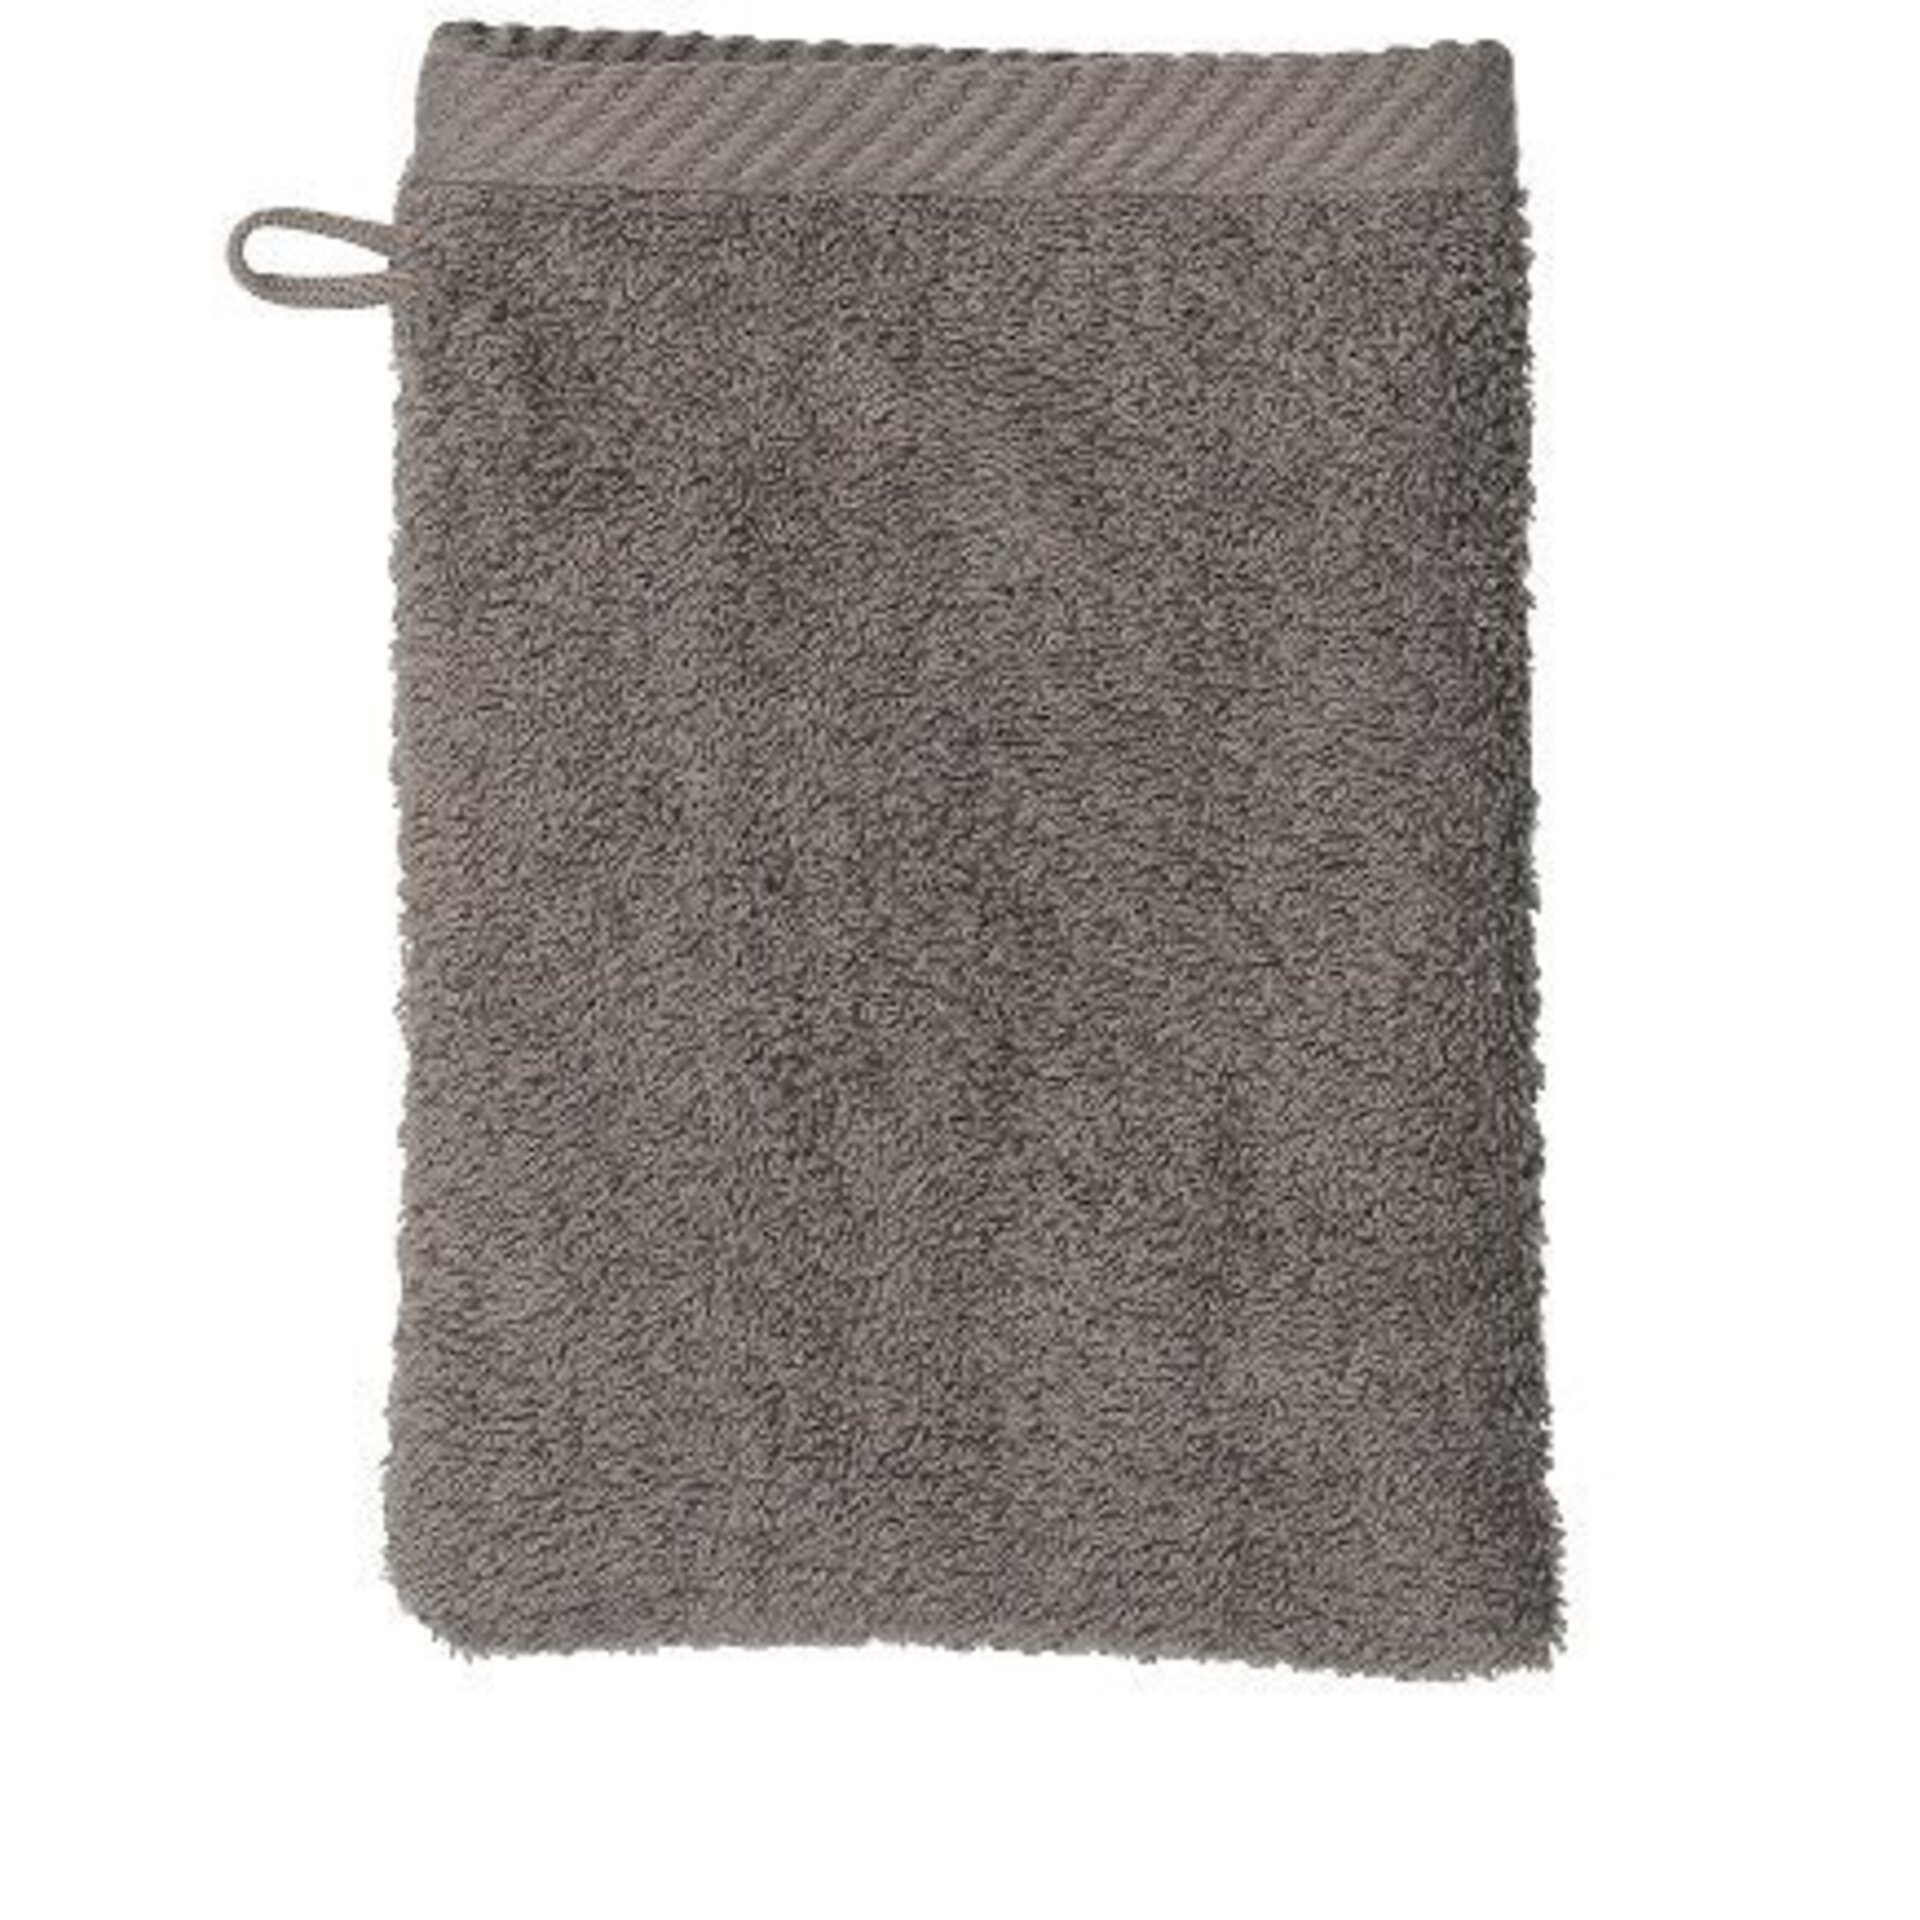 Waschhandschuh Ladessa Kela Textil grau